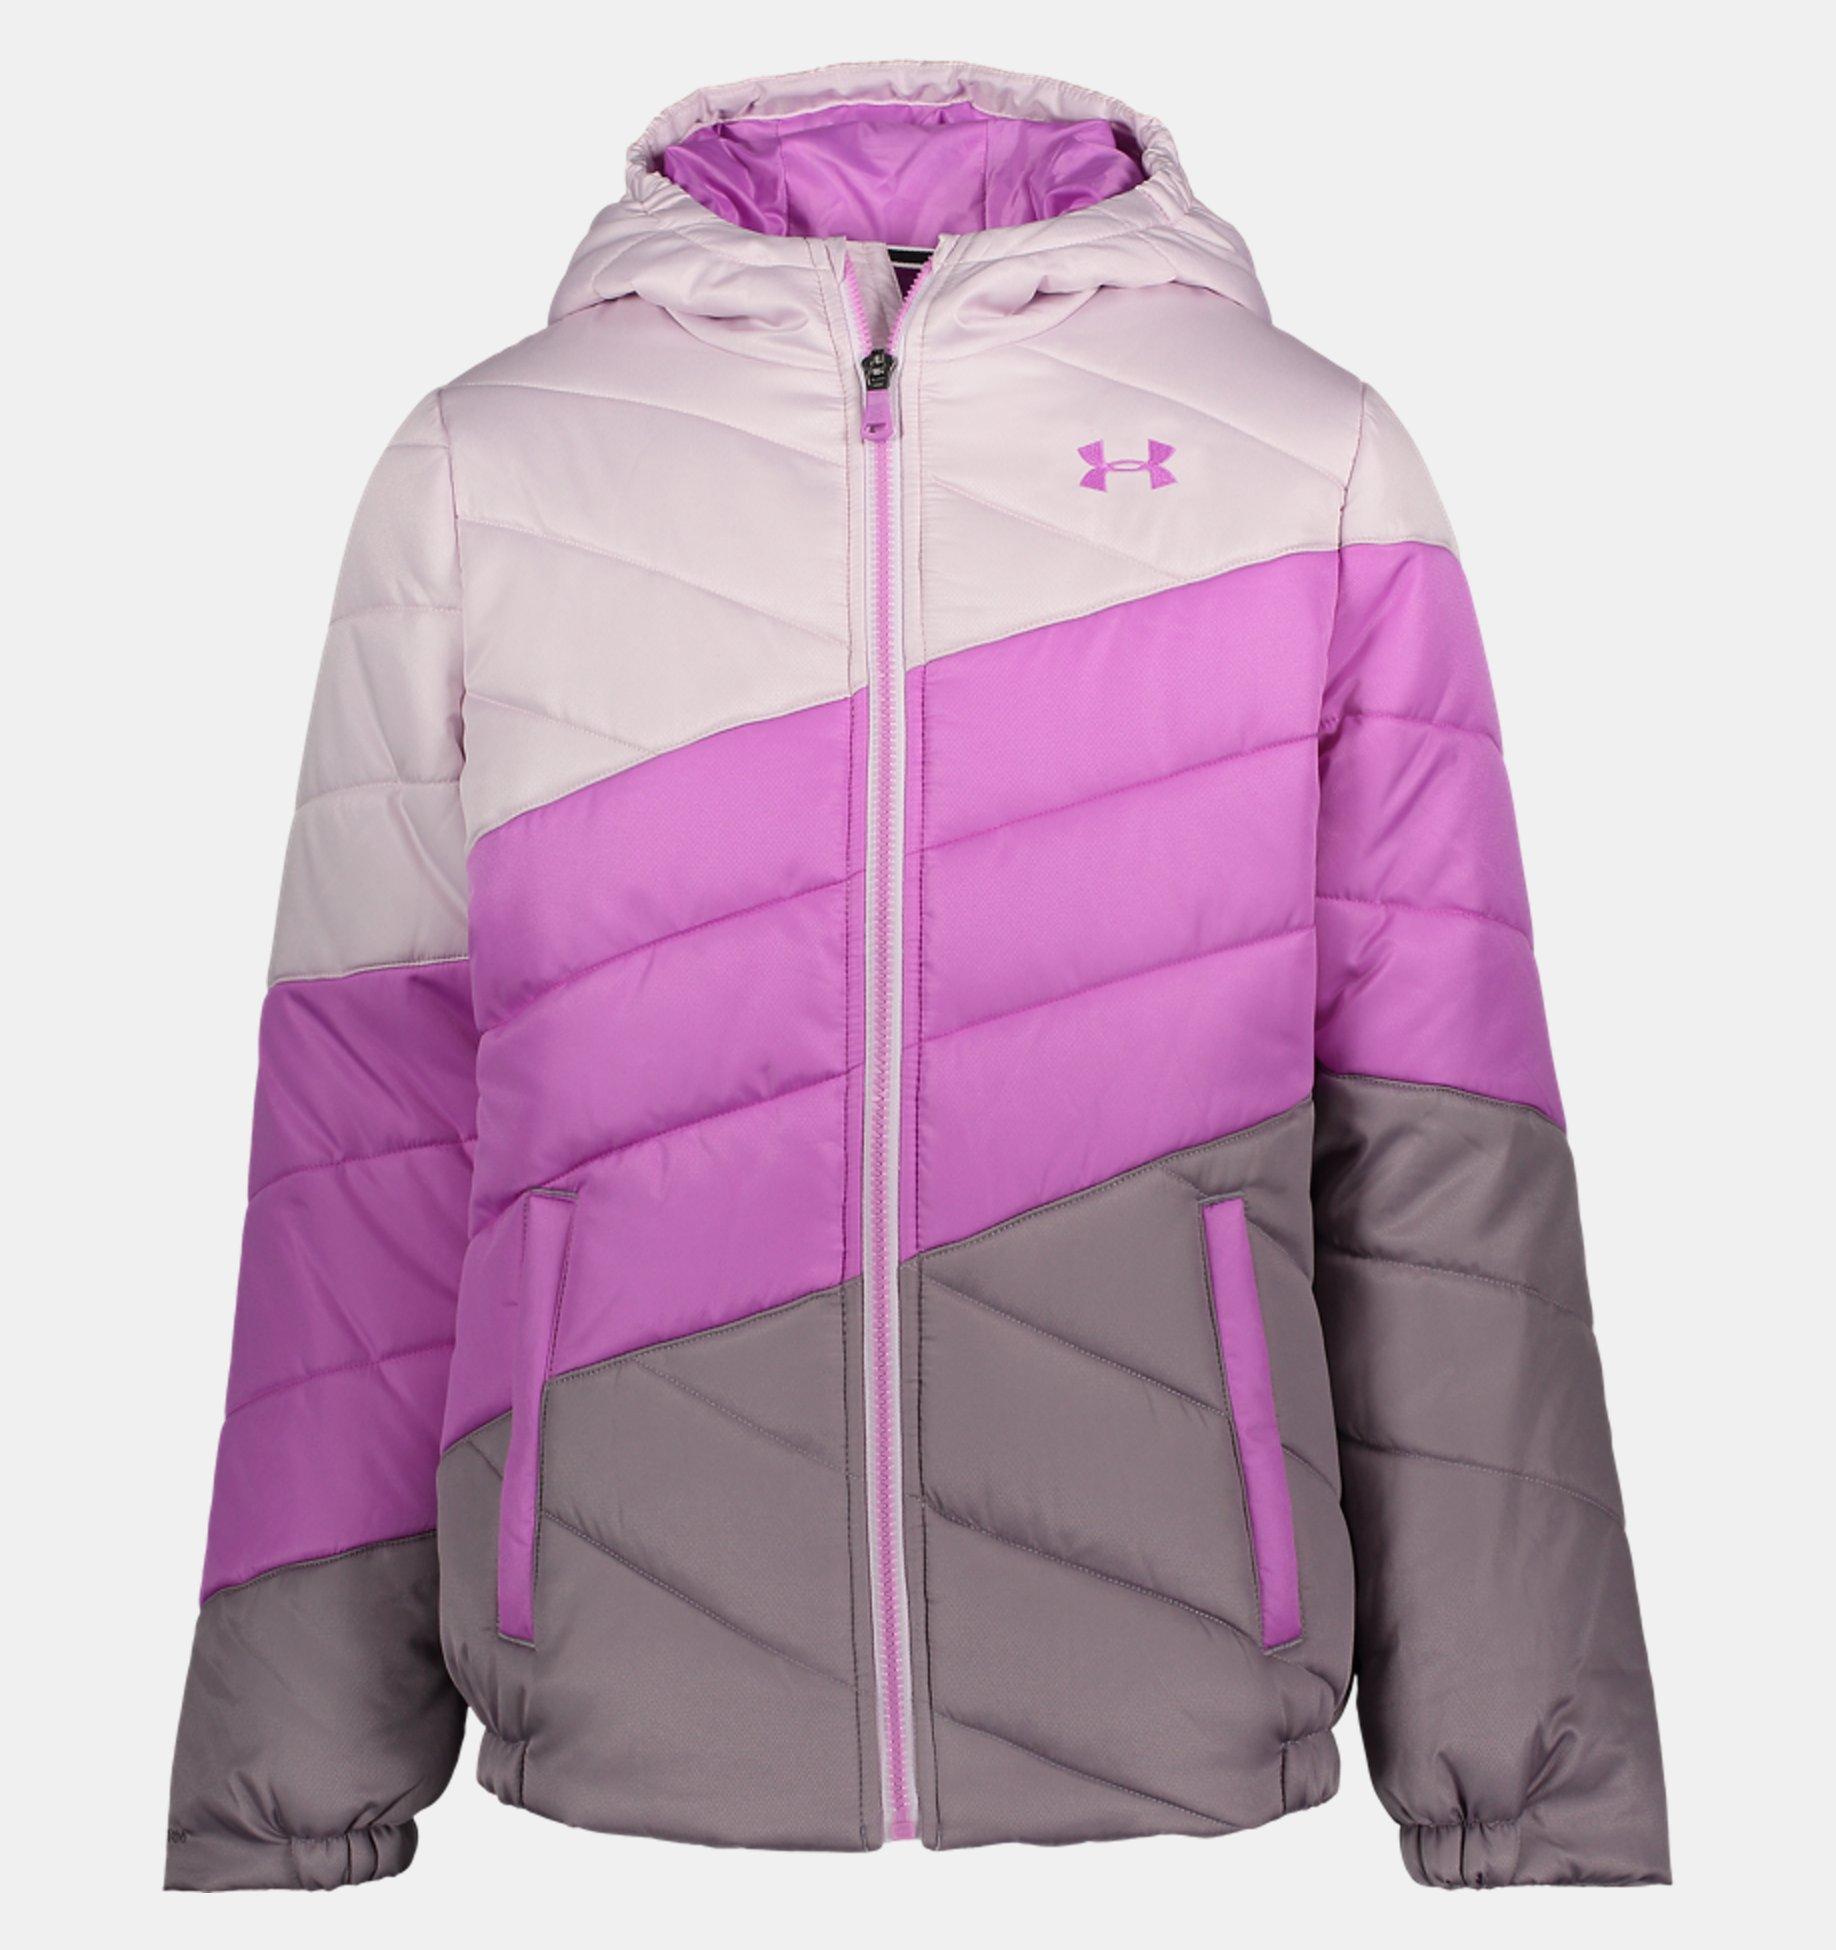 Underarmour Girls UA Prime Block Puffer Jacket